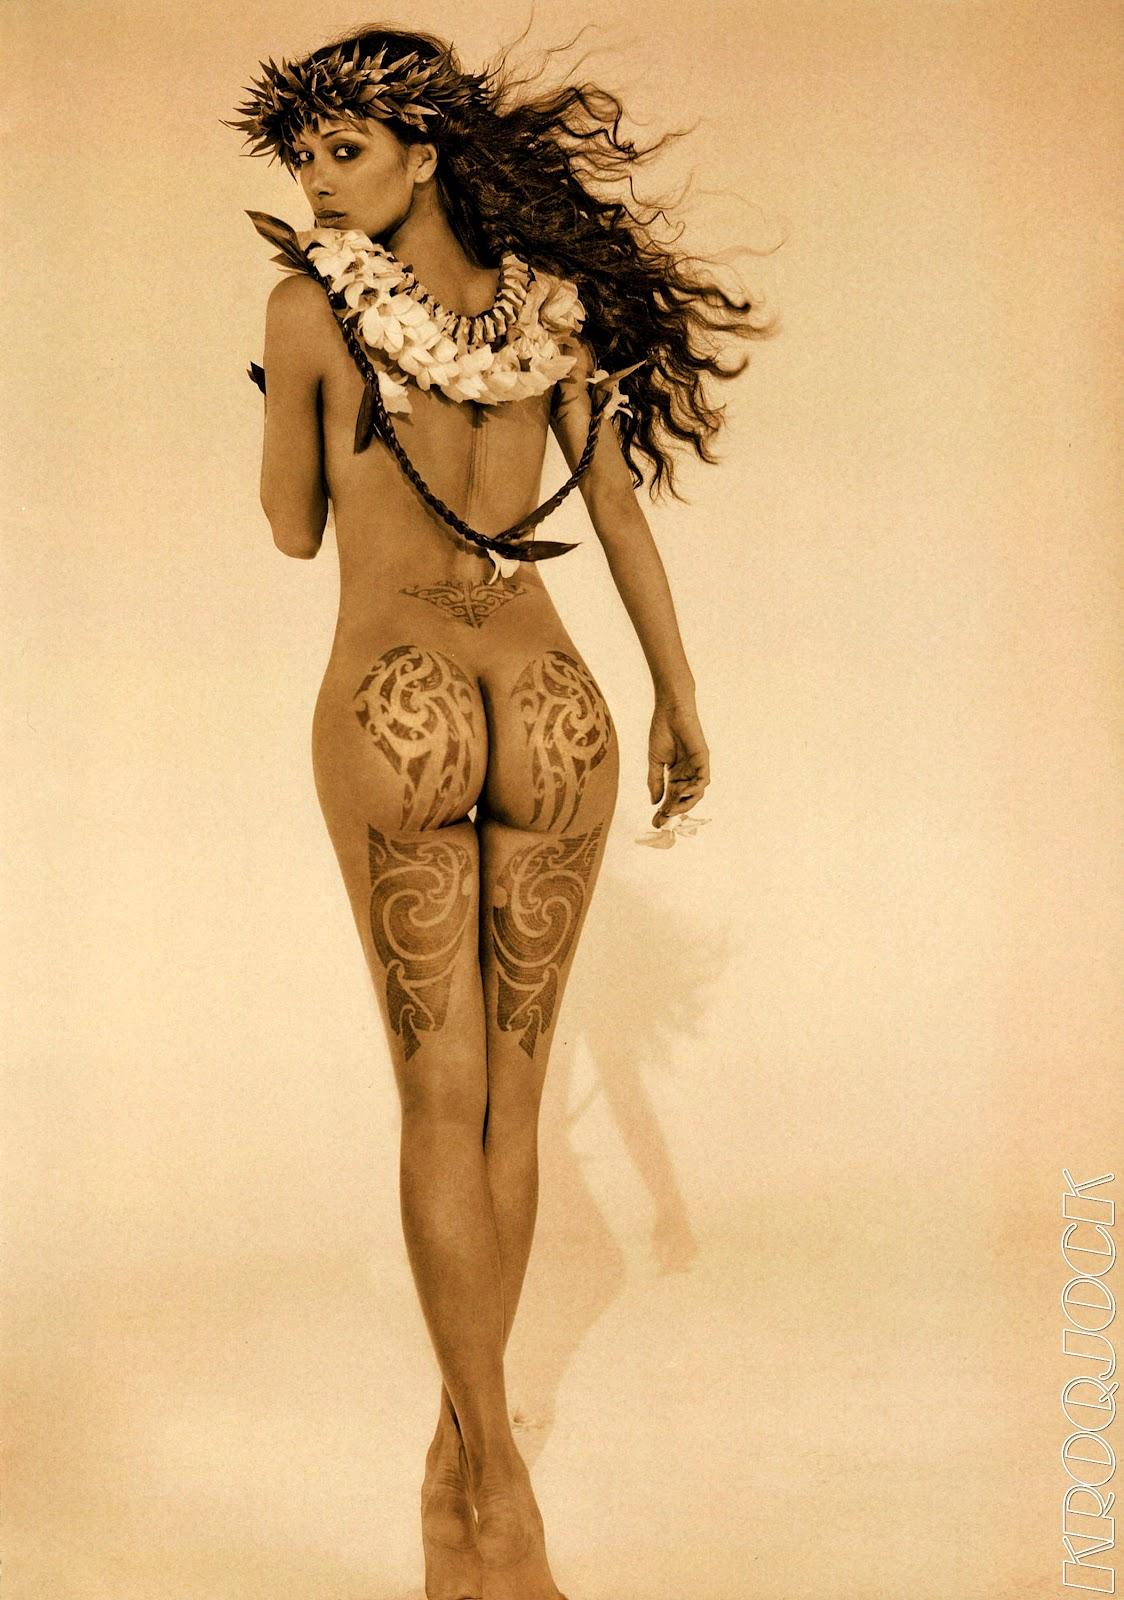 Nicole sherzinger nude pics simply ridiculous